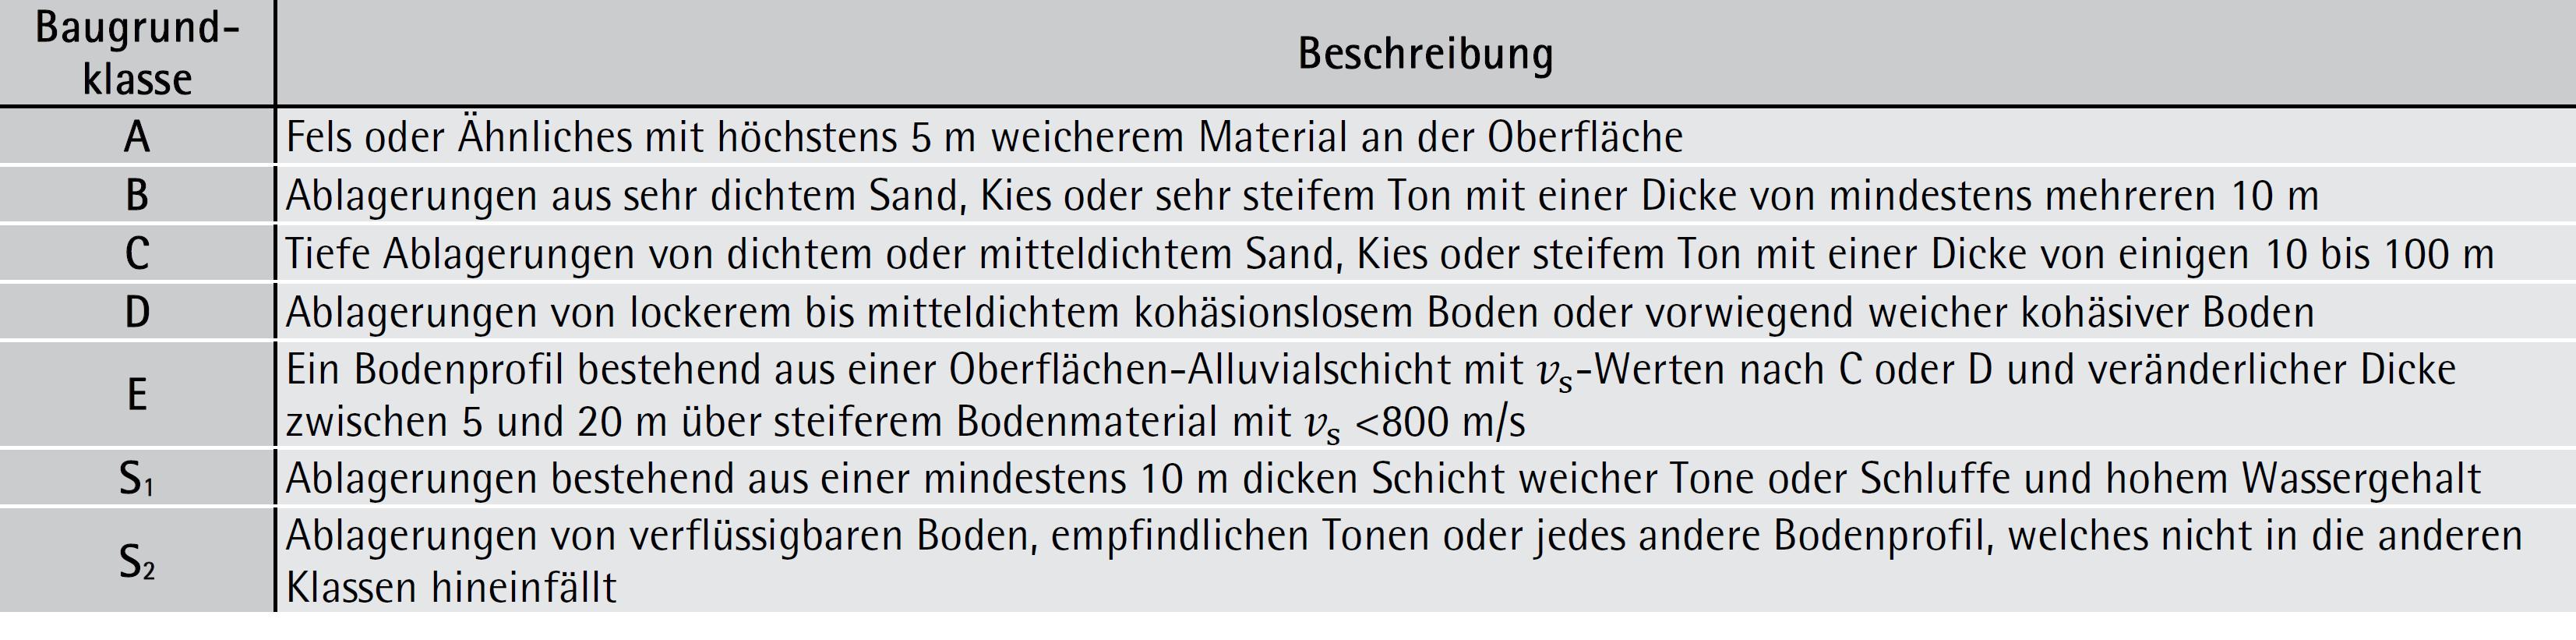 Baugrundklassen – ÖNORM EN 1998-1